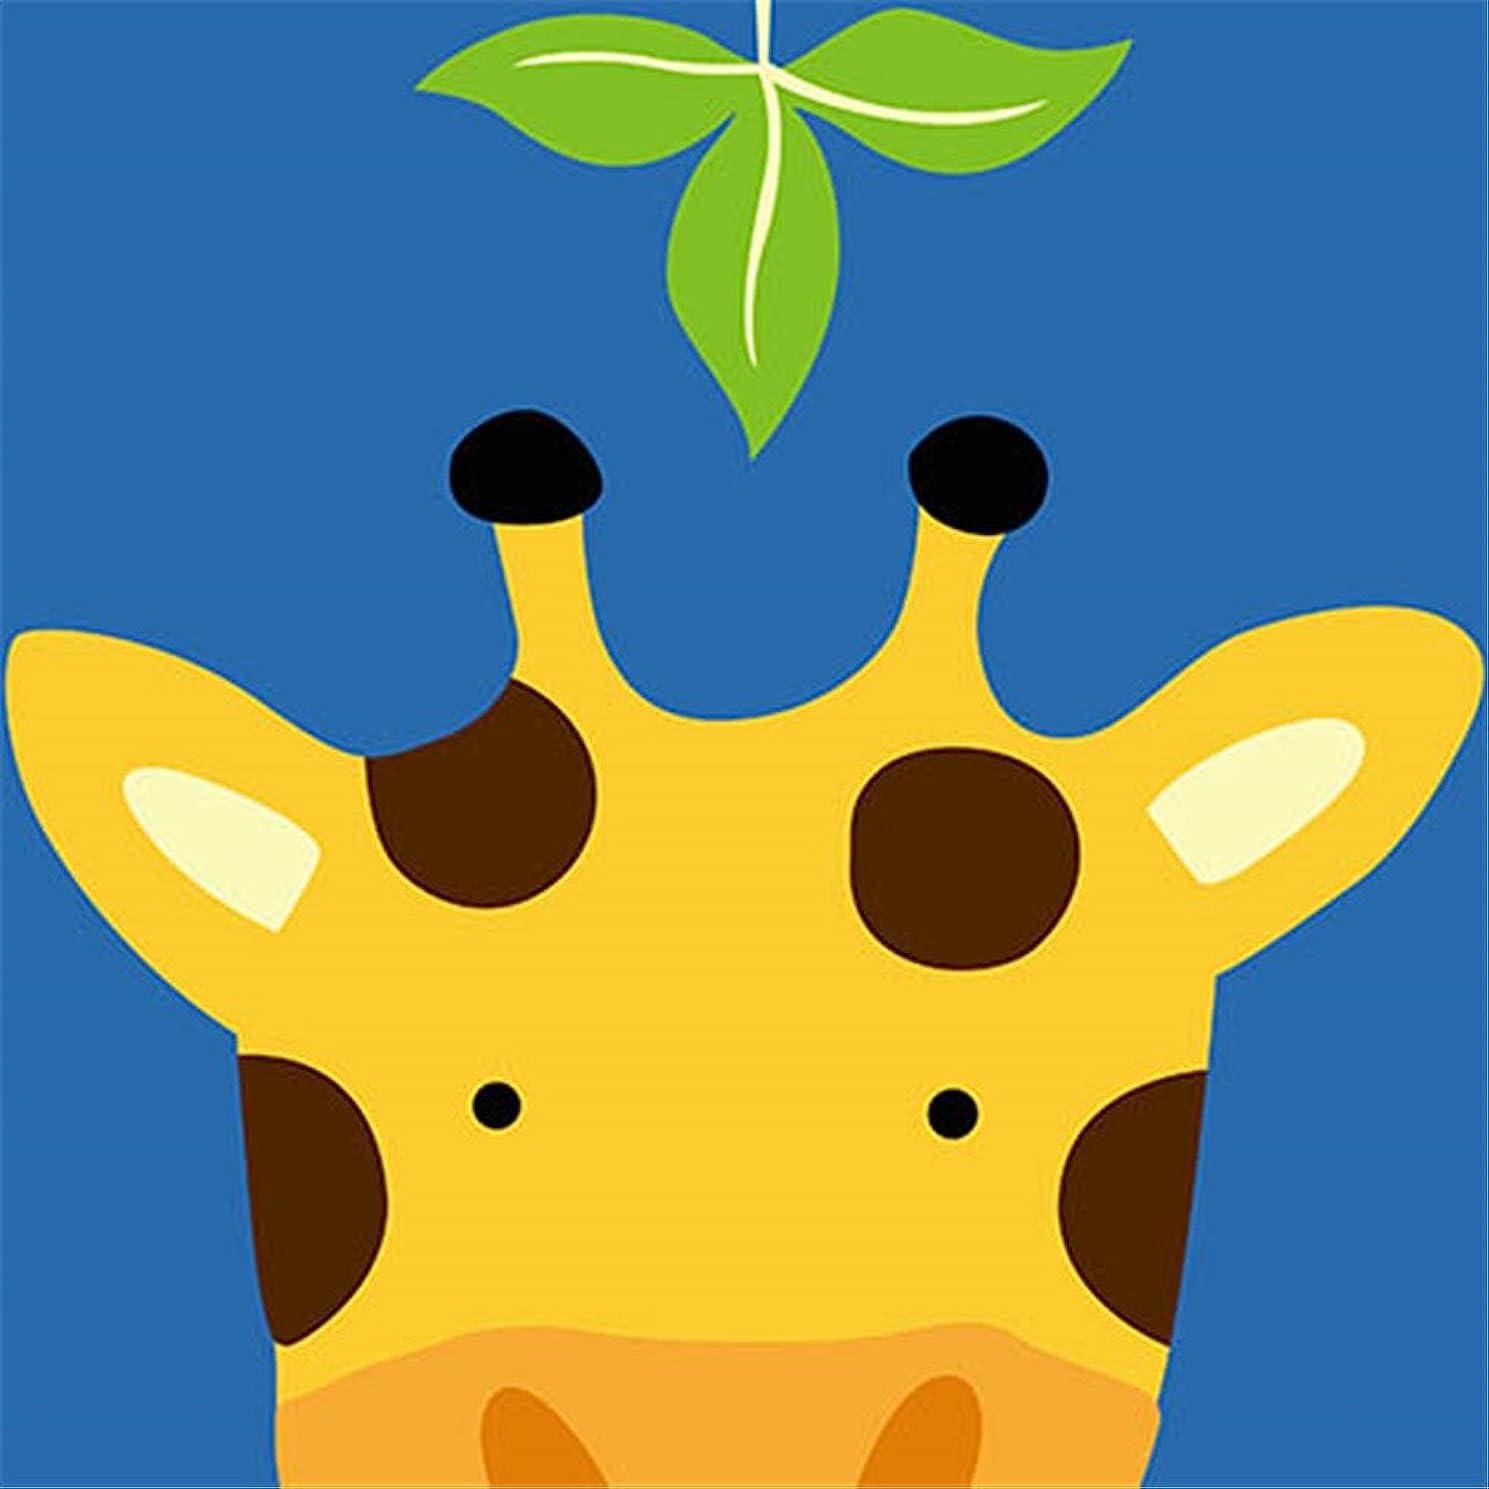 YEESAM ART New Paint by Numbers for Kids Children Beginner - Animal Giraffe & Green Leaves 8x8 inch Linen Canvas - DIY Number Painting (Giraffe)